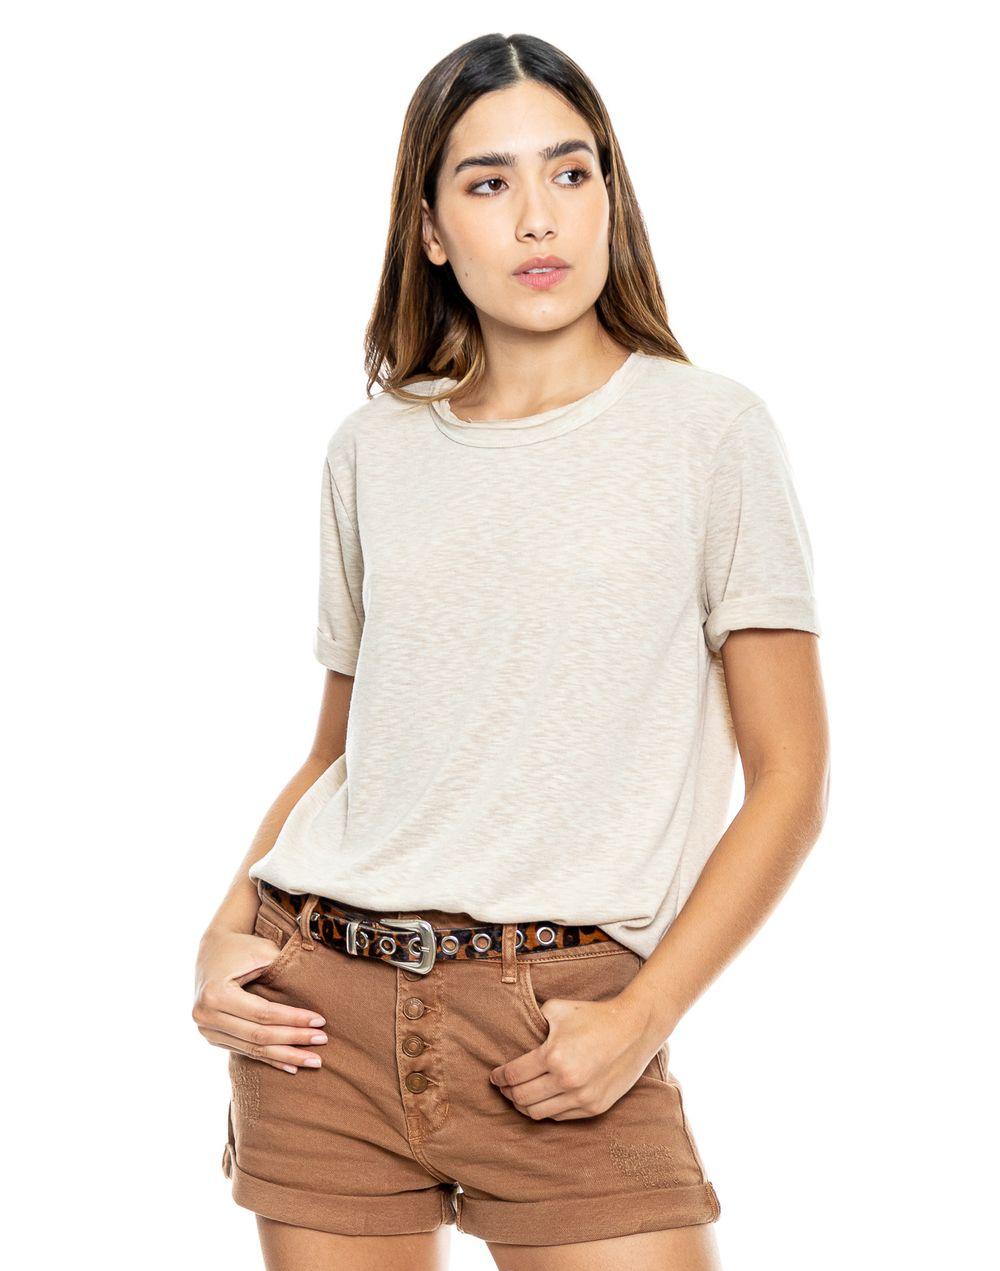 camiseta-124306-cafe-1.jpg